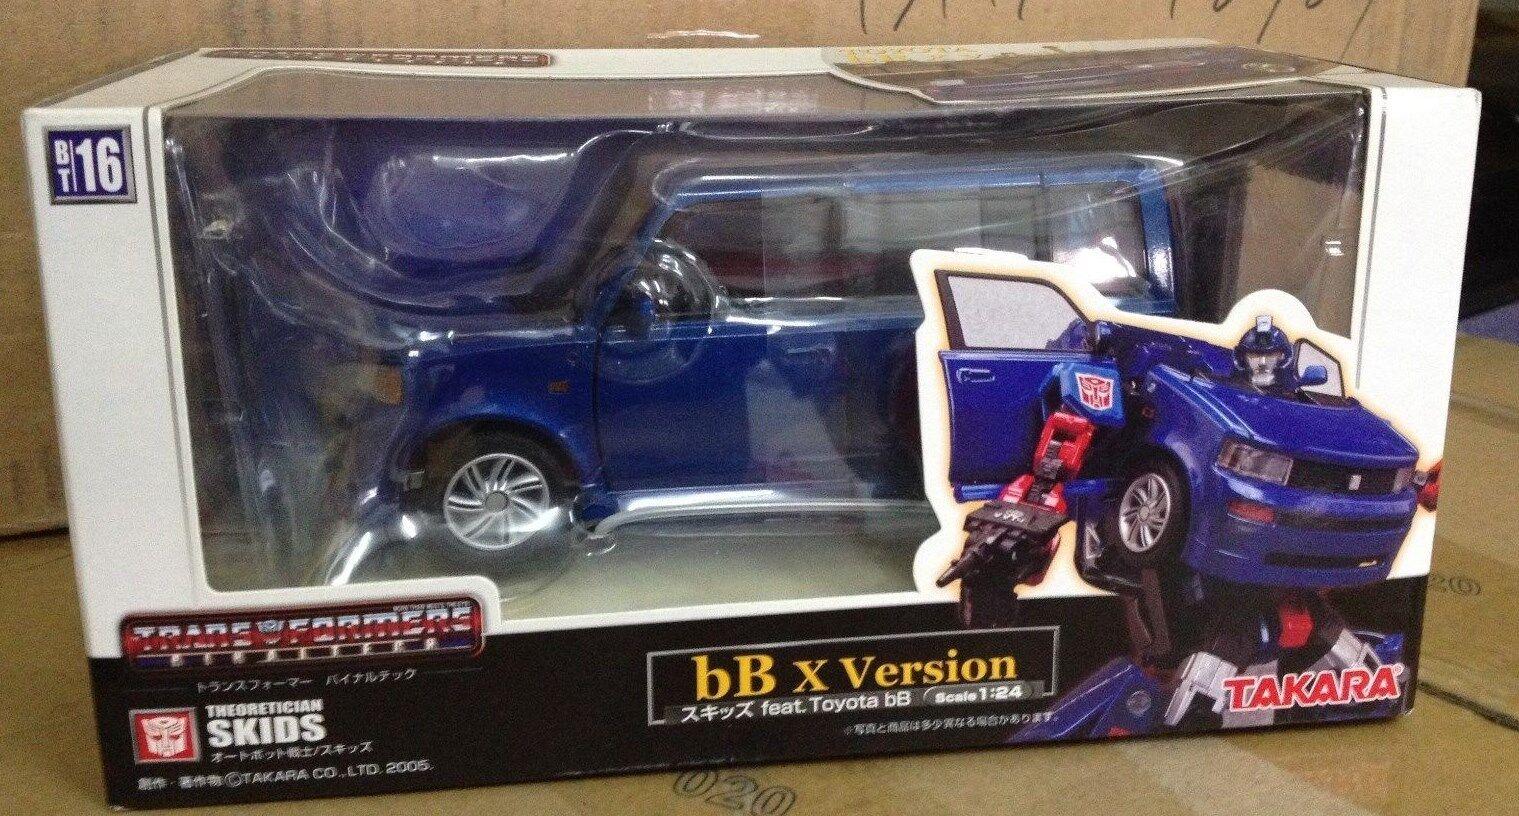 2005 Transformers BT series Toyota Bb X Skids Robots 1 24 TAKARA JP ver diecast